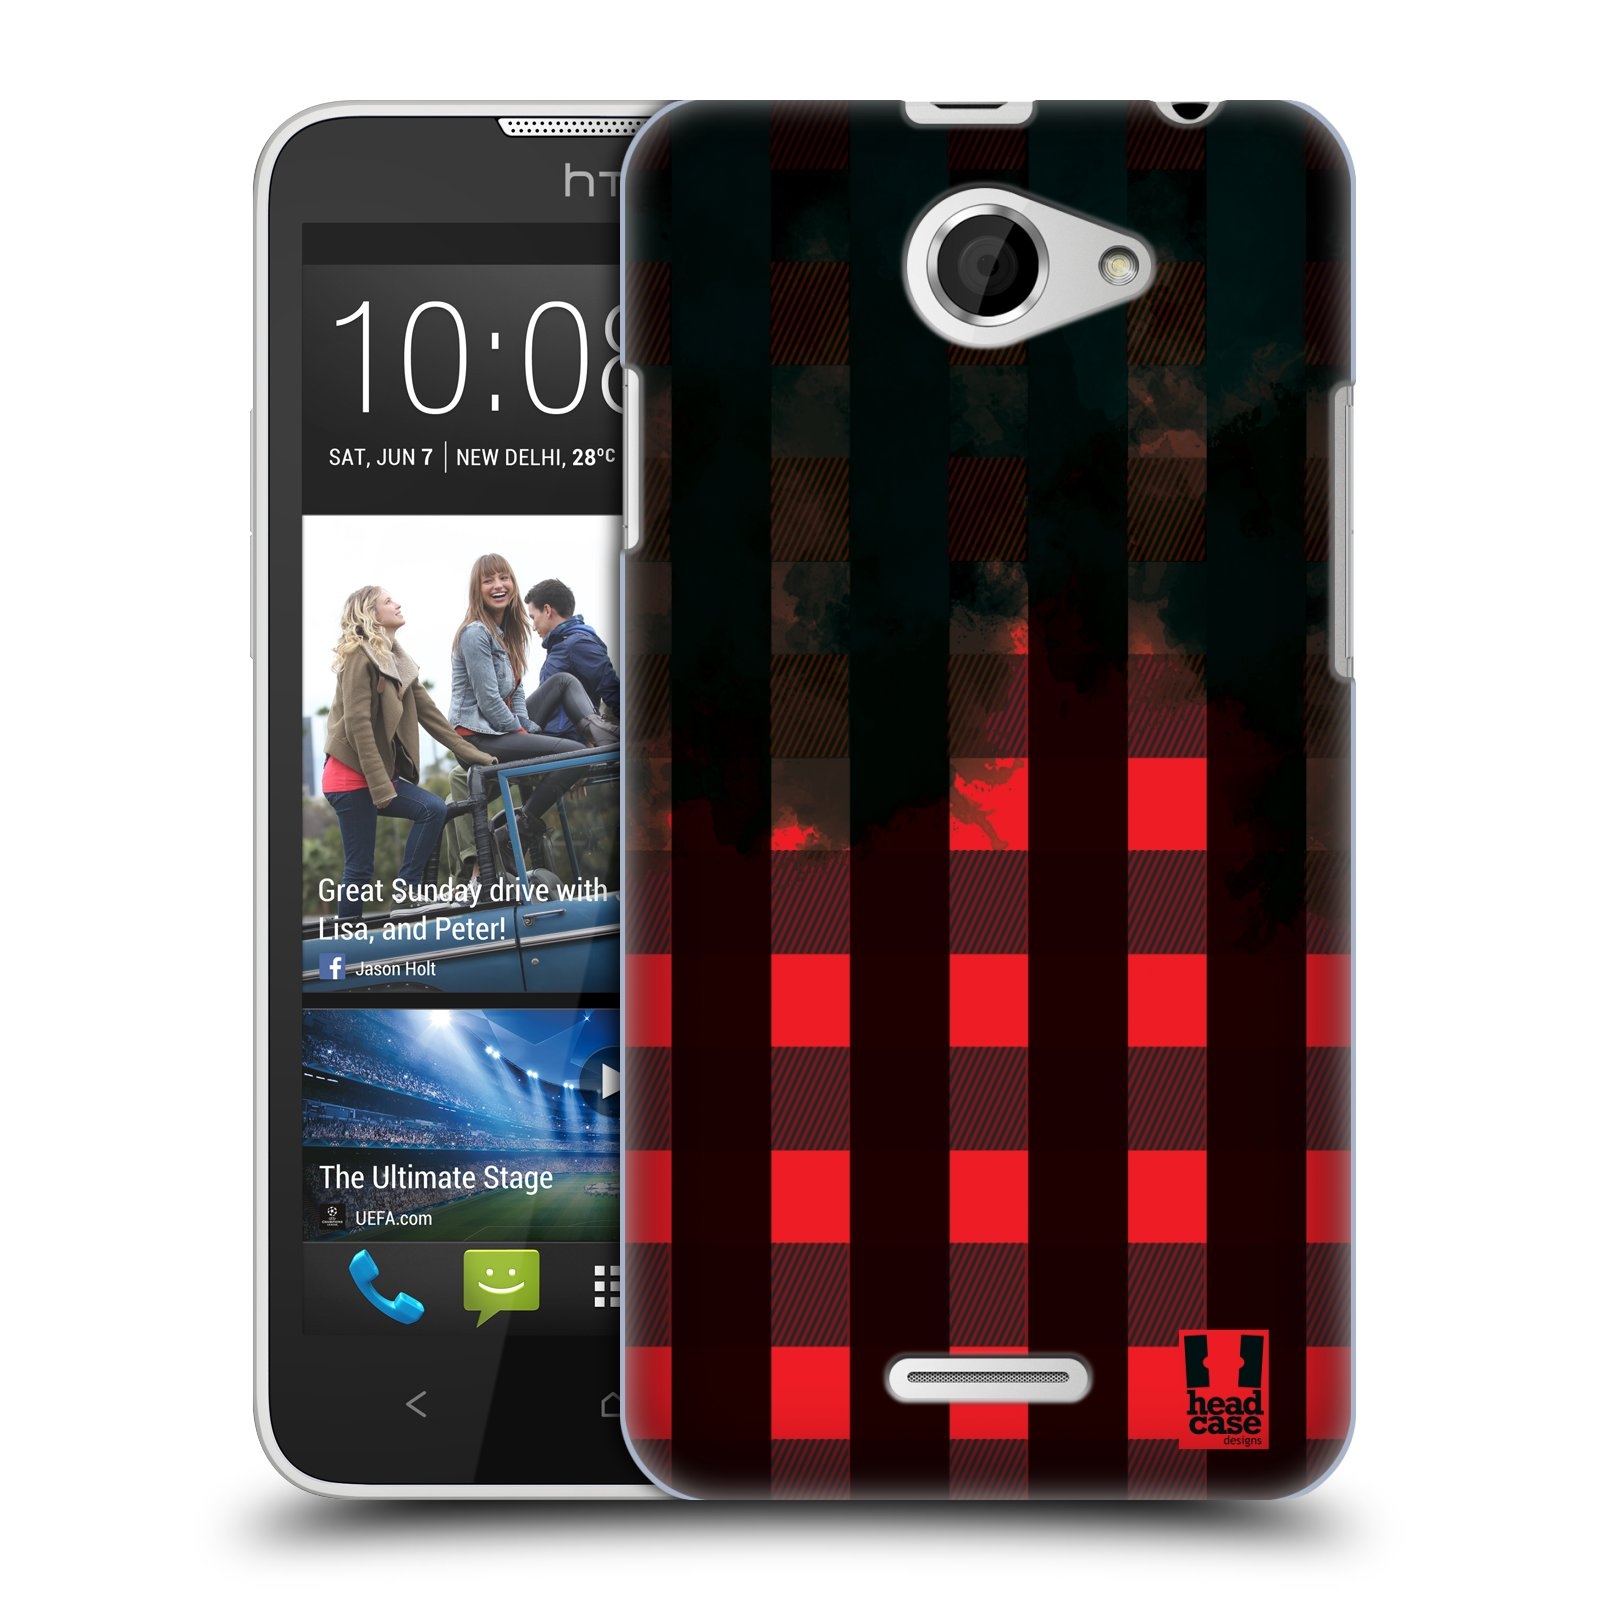 Plastové pouzdro na mobil HTC Desire 516 HEAD CASE FLANEL RED BLACK (Kryt či obal na mobilní telefon HTC Desire 516 Dual SIM)